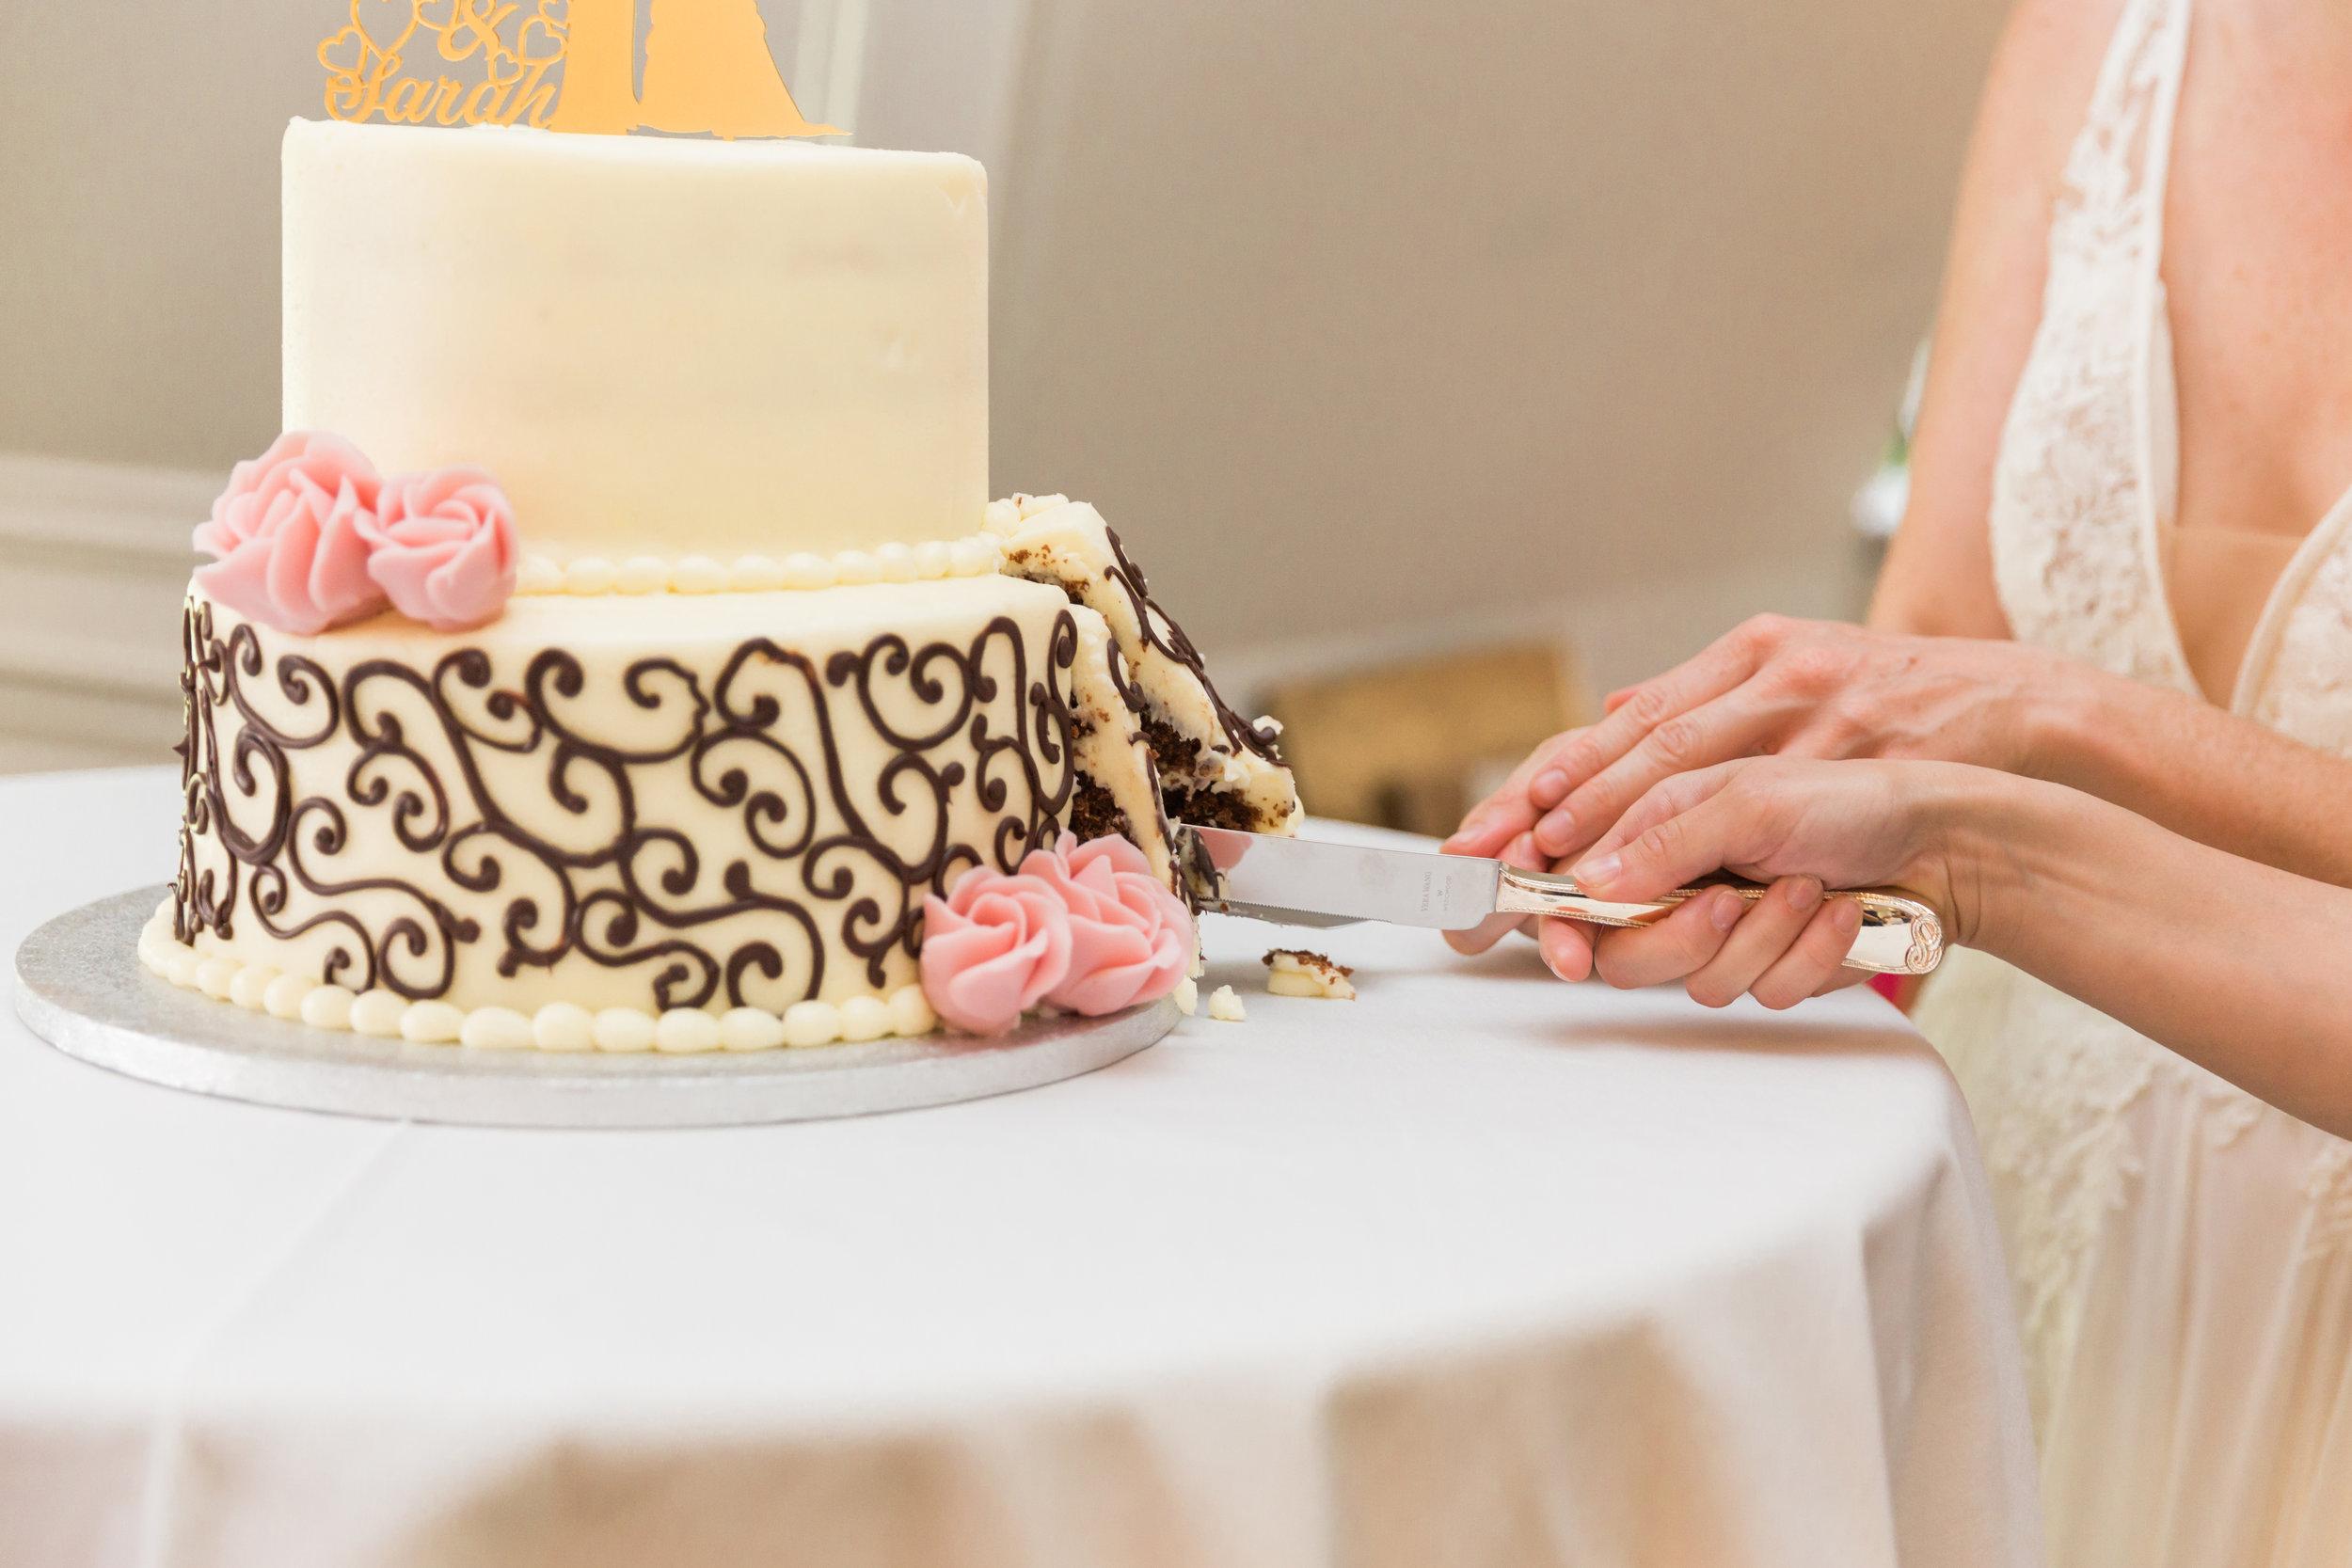 cutting-the-cake.jpg